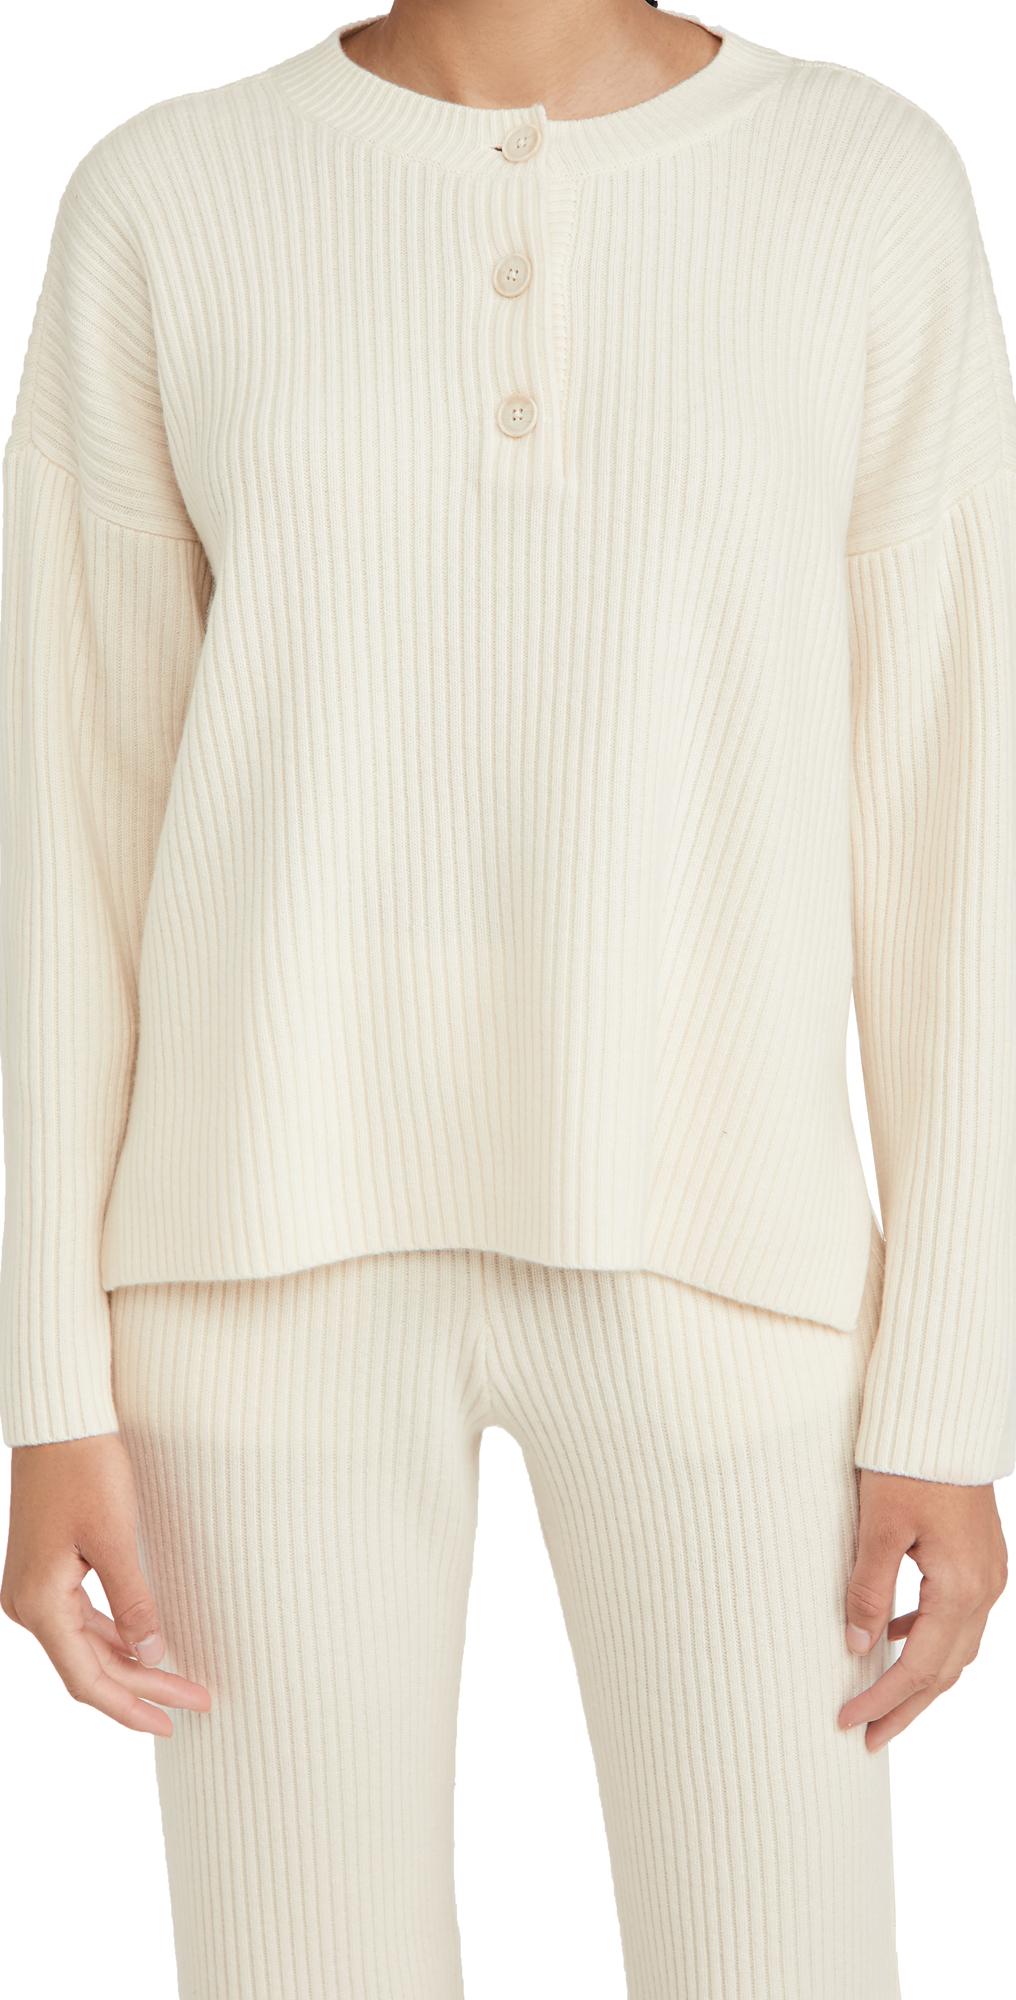 Club Monaco Ribbed Henley Sweater